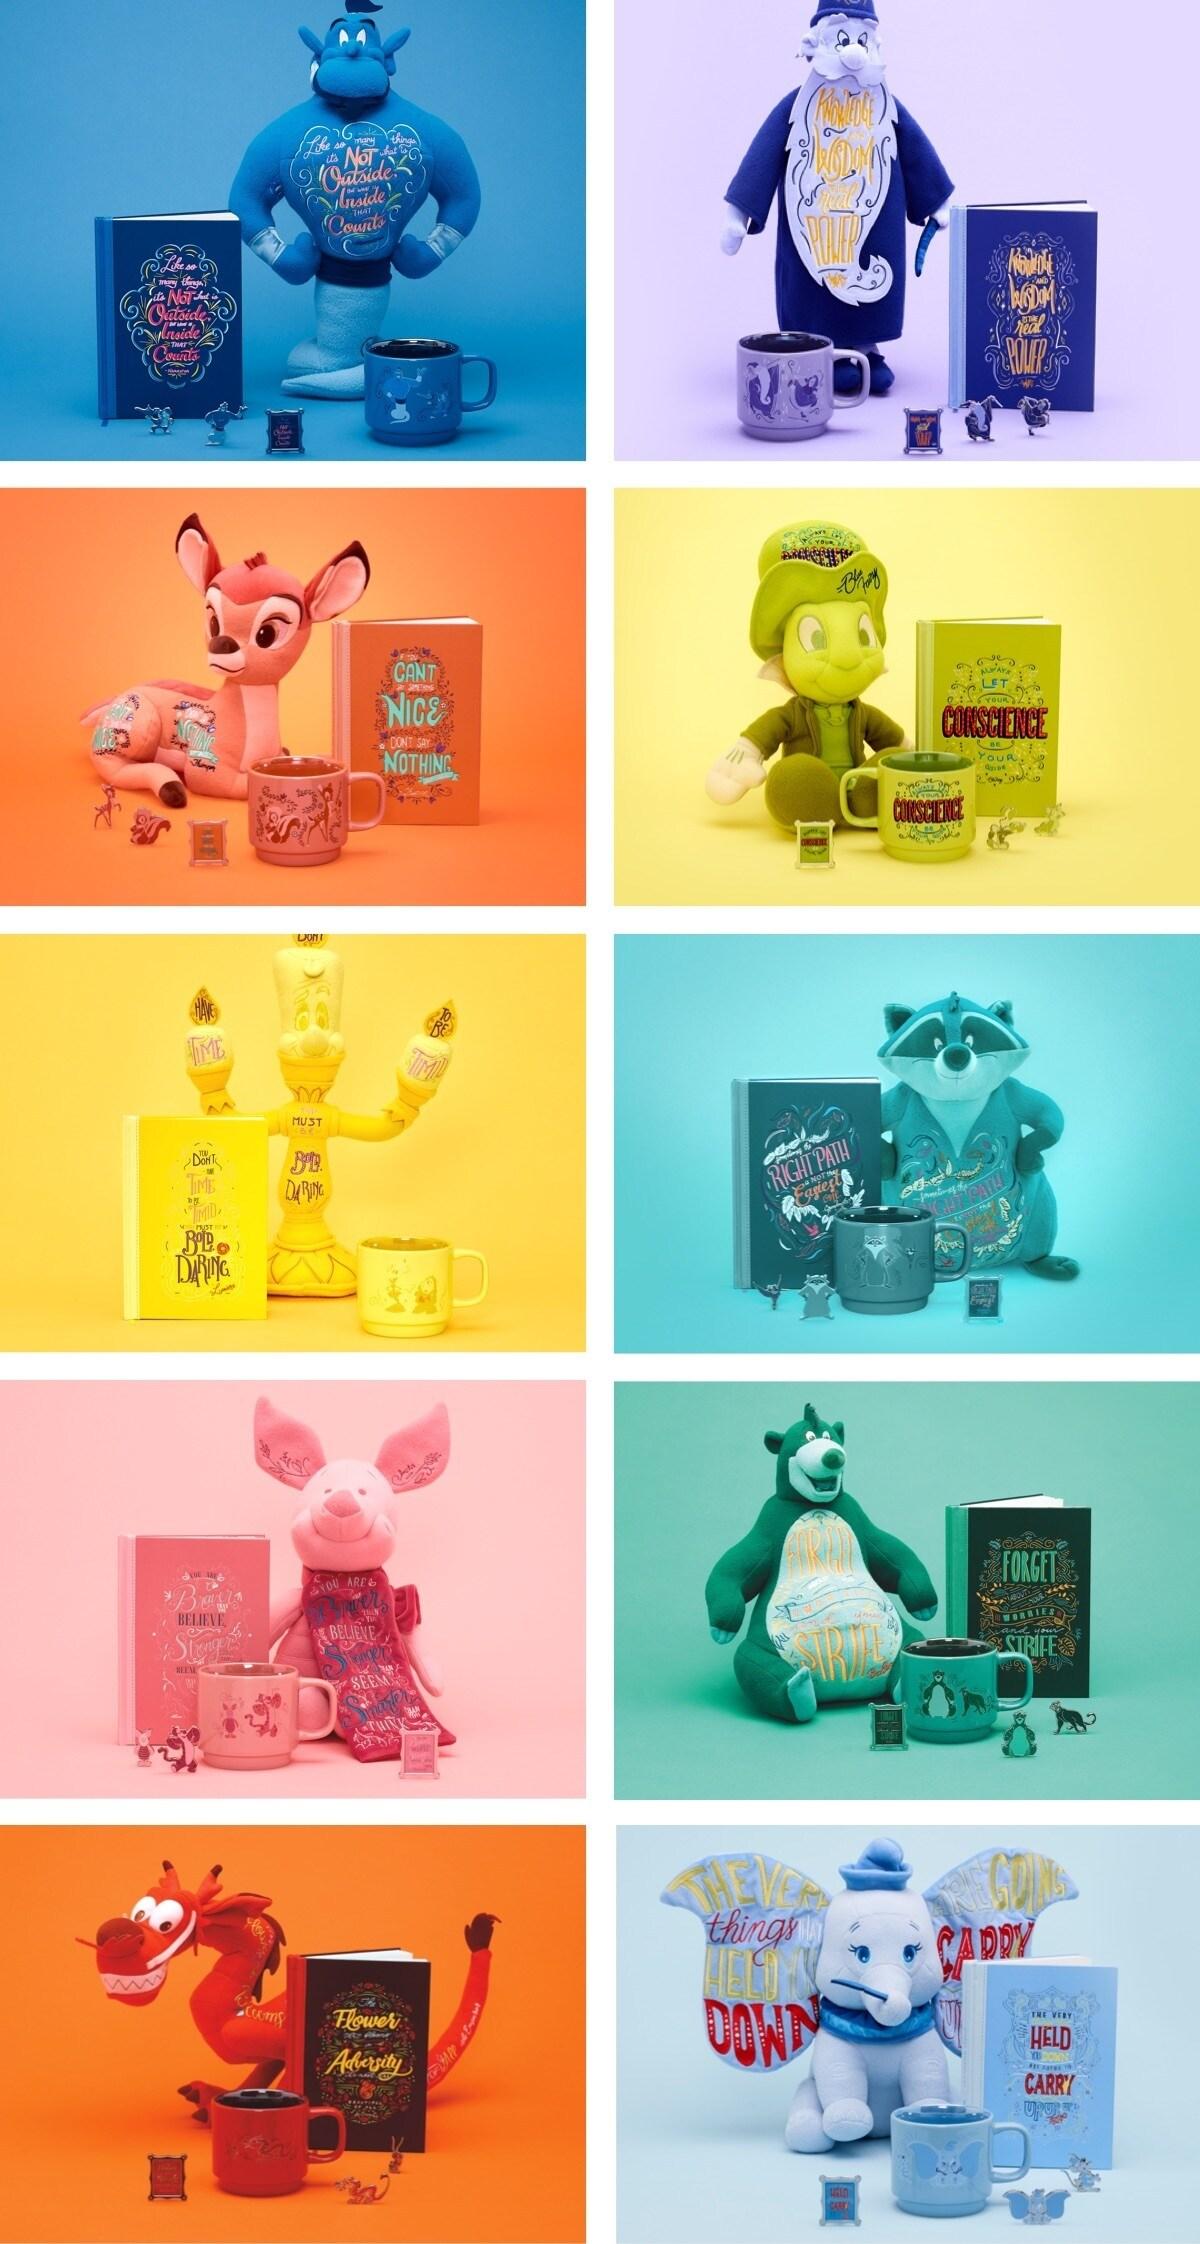 The Disney Wisdom Collection: Dumbo, Mushu, Baloo, Porcinet, Meeko, Lumiére et Jiminy Cricket